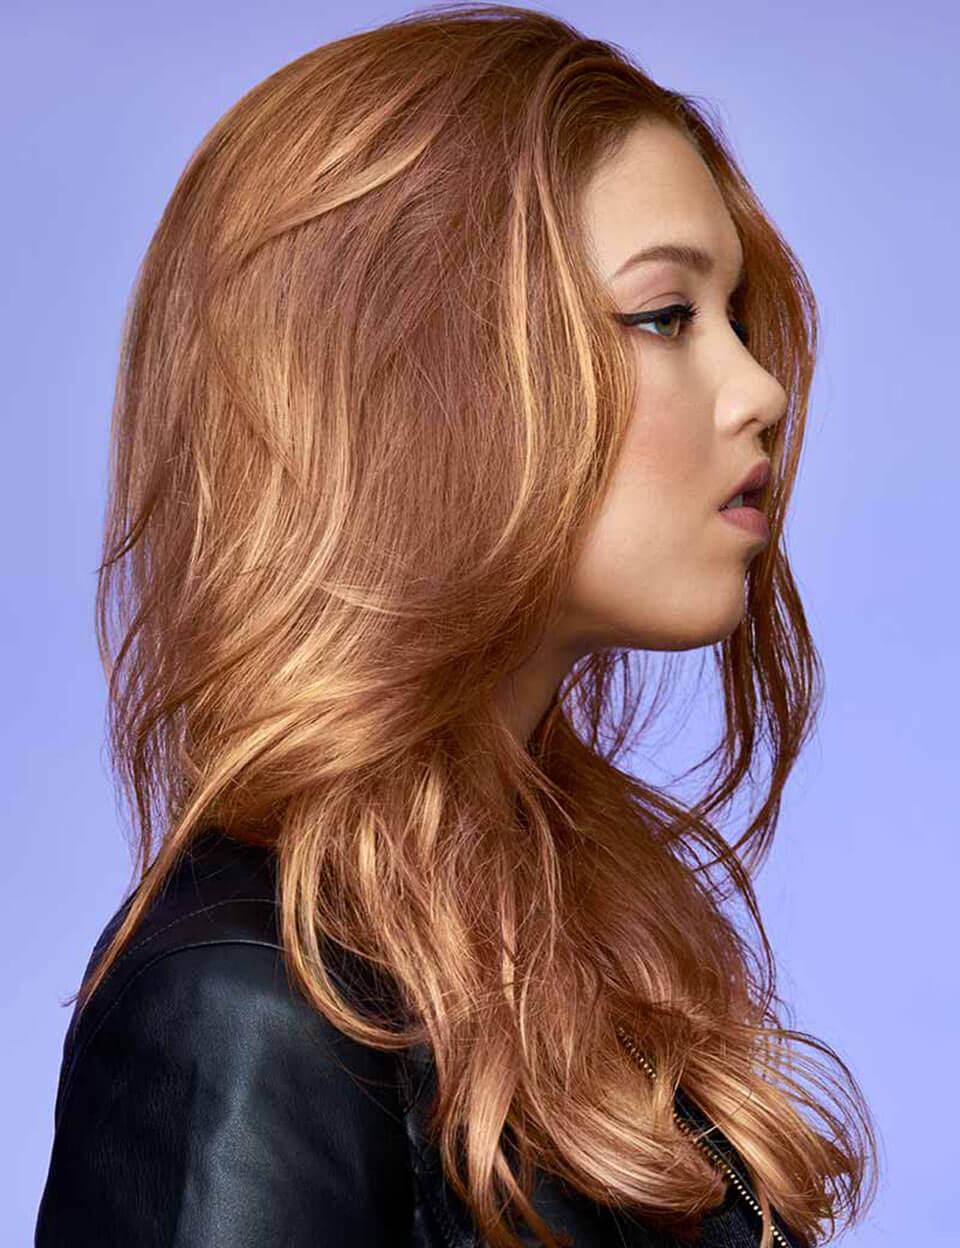 Strawberry blonde - cabelo ruivo